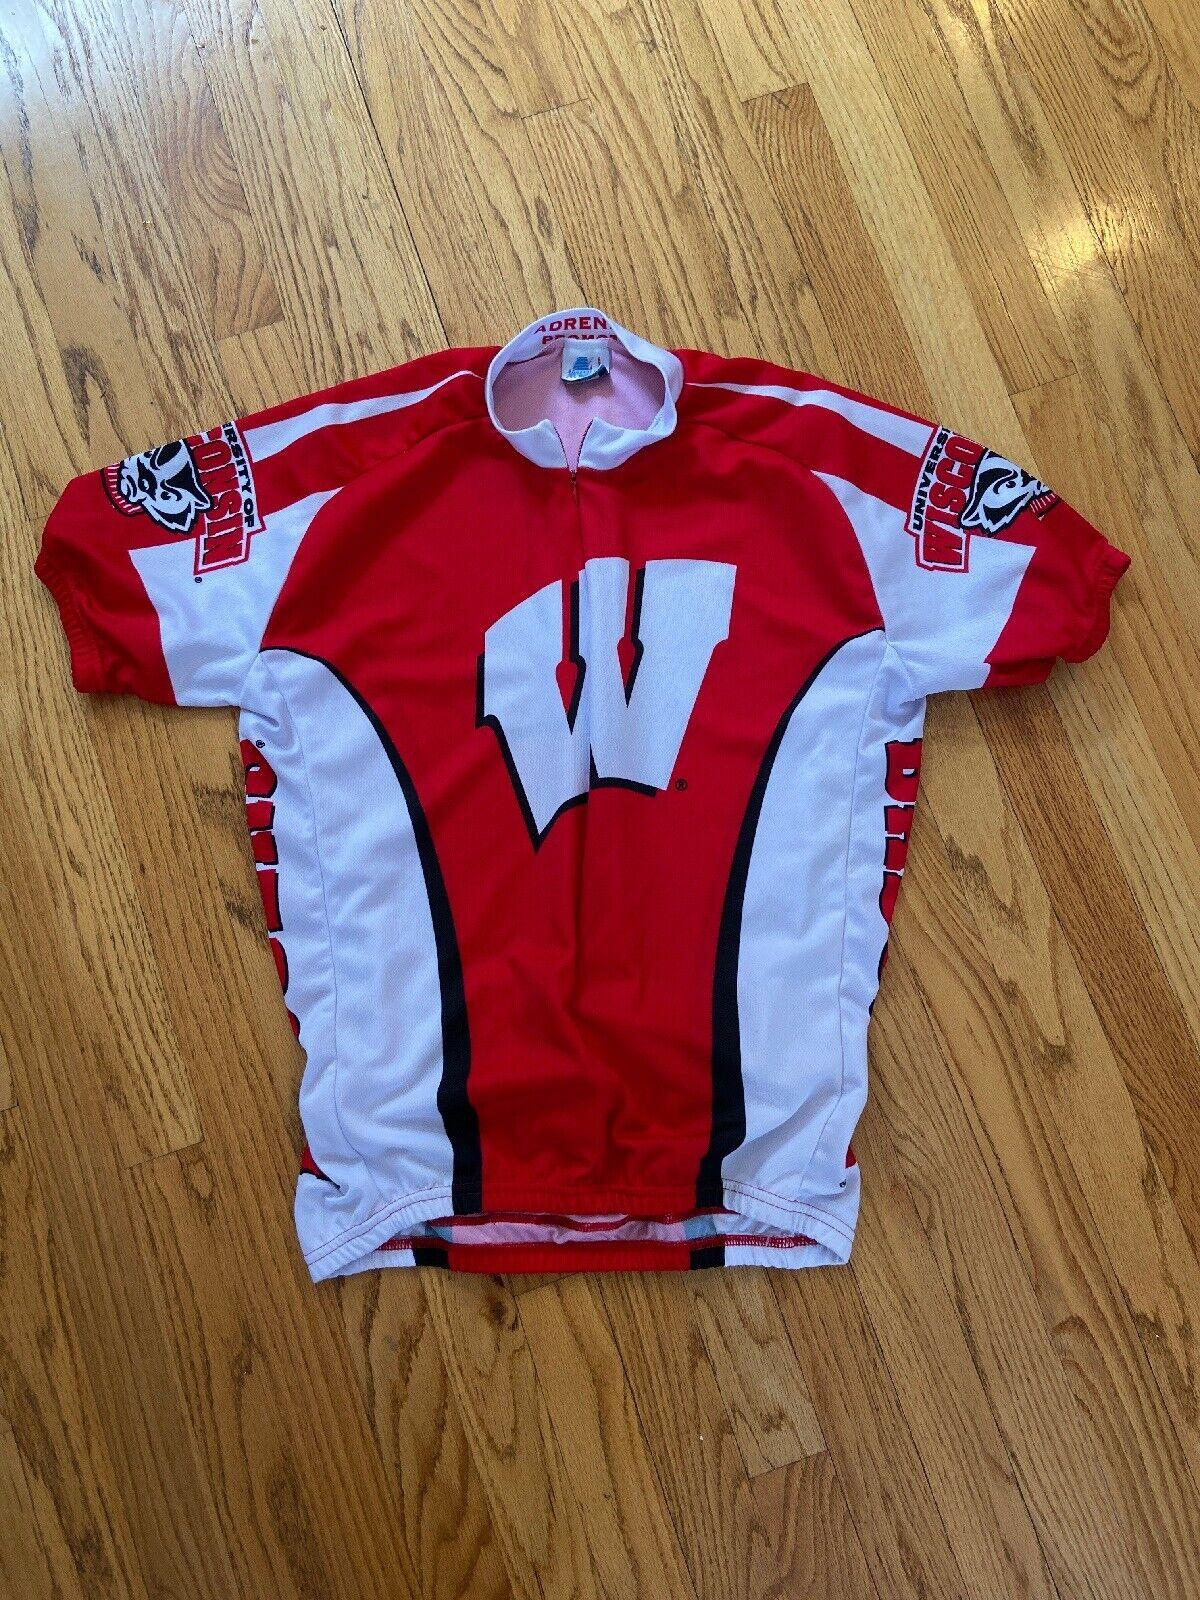 WISCONSIN Badgers Racing Bike Cycling Jersey adult Größe XL NCAA World Jerseys